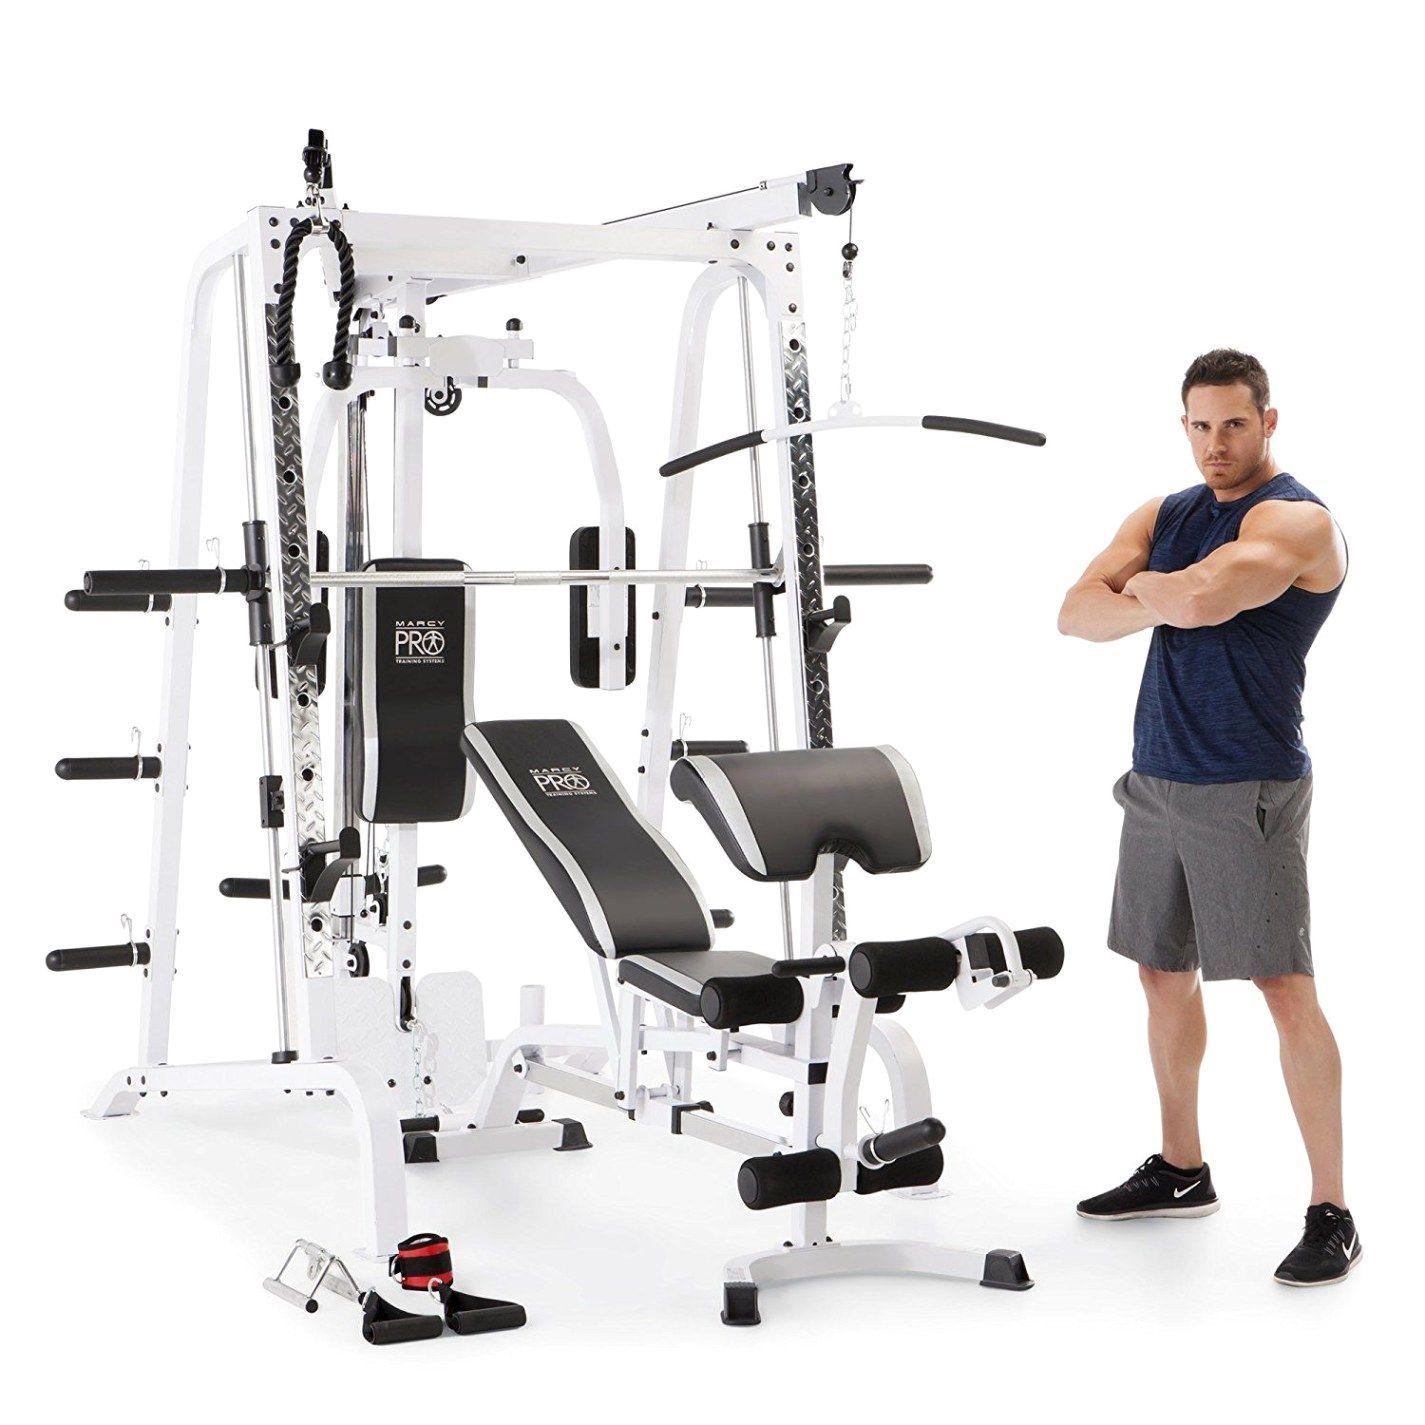 59108cc87f3 Moms Exercise Gym  fitnessaddict  athomegymmachines